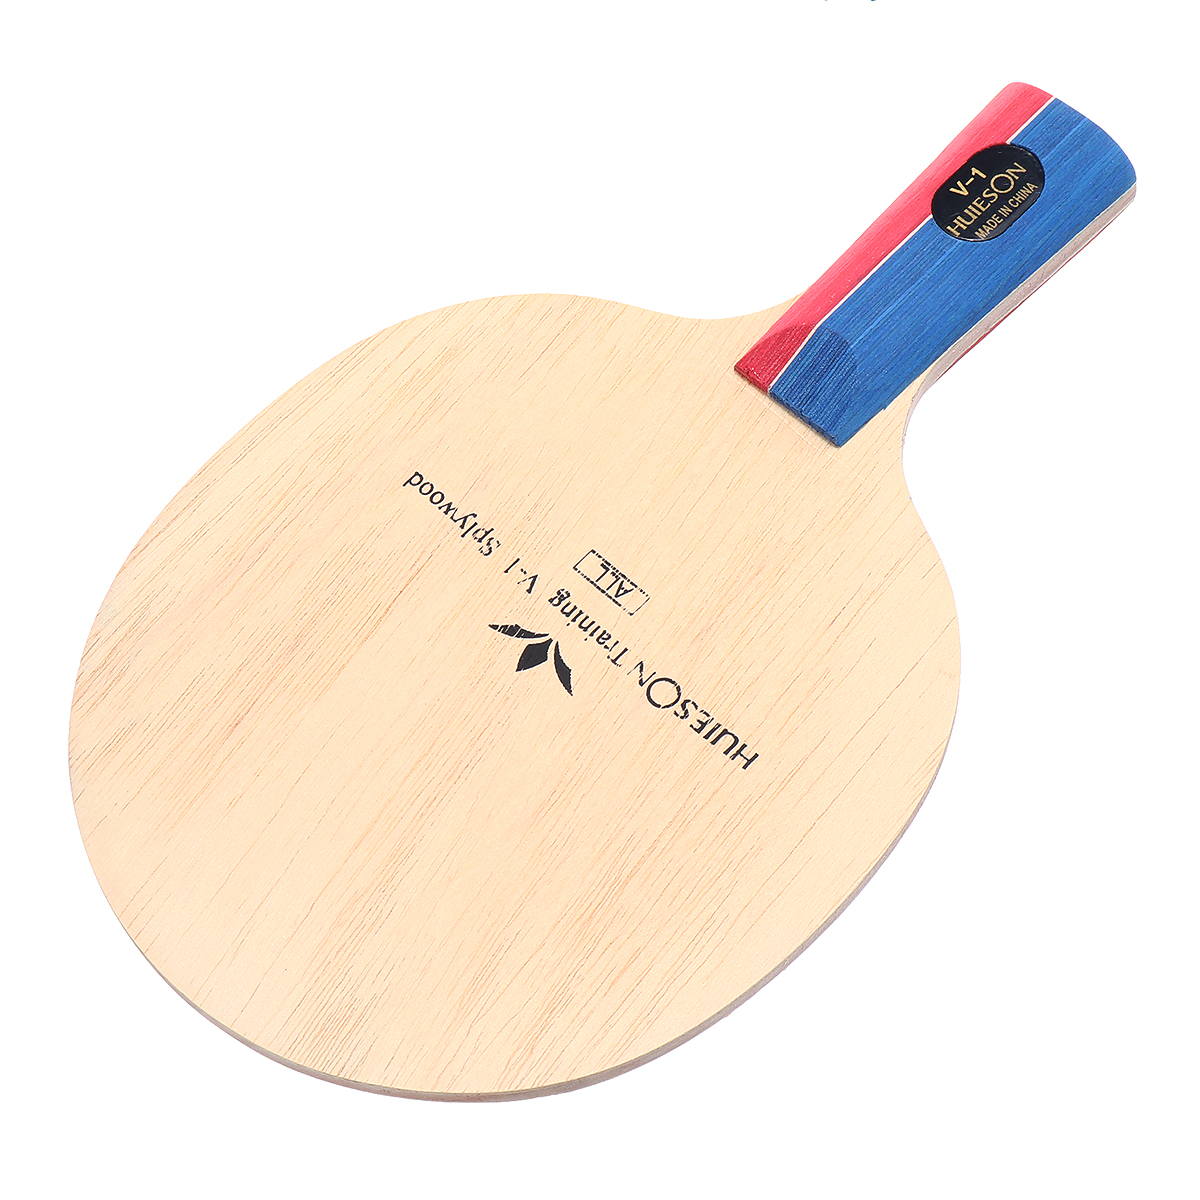 1 Pcs FL/CS Table Tennis Racket 5-layer Pure Wood Training Table Tennis Floor Horizontal Racket Direct Racket